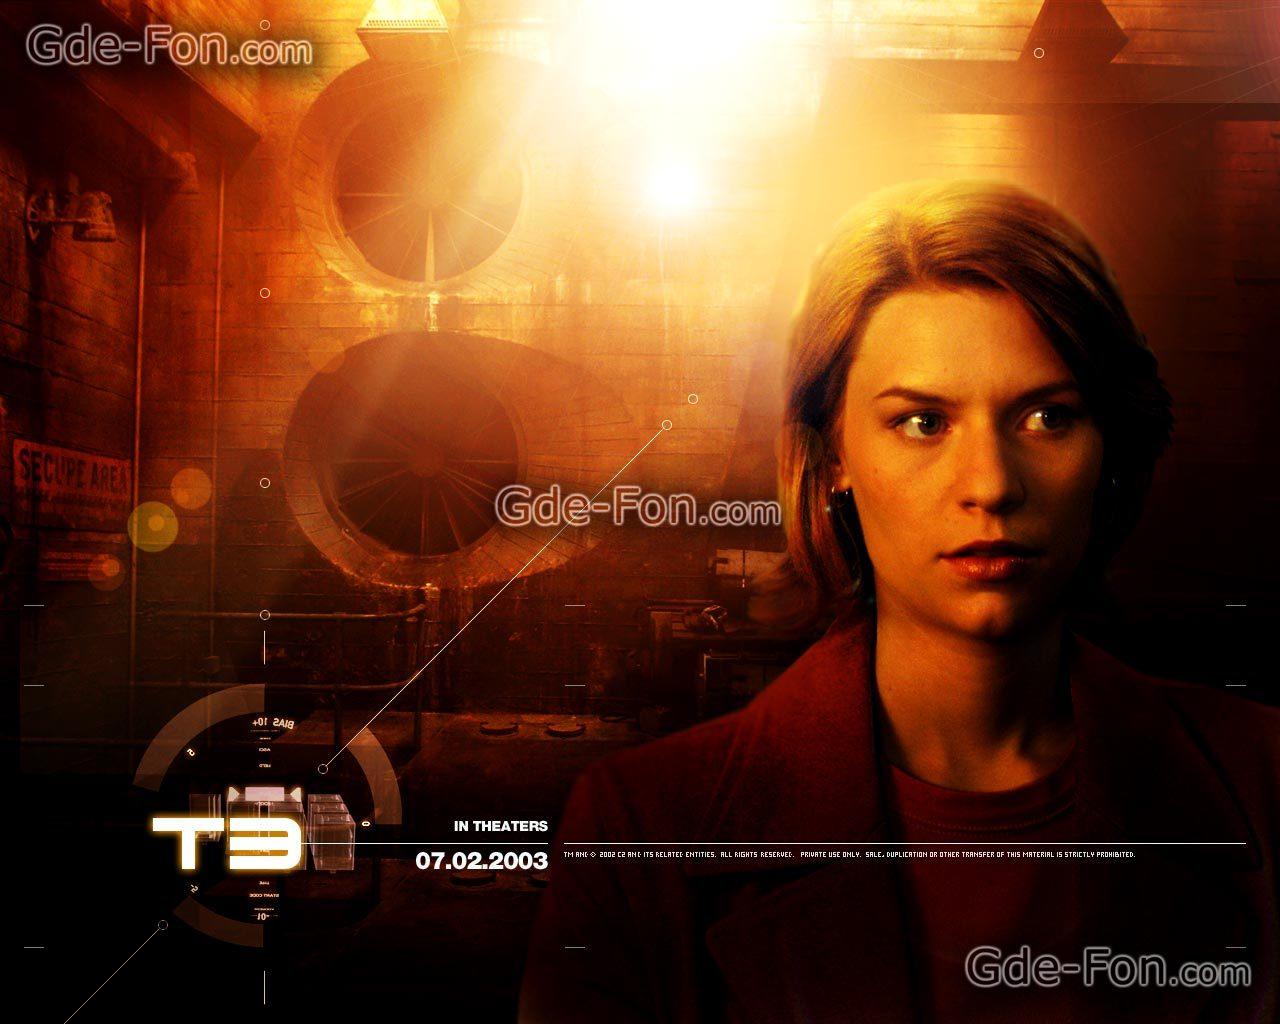 Terminator 3 Wallpaper 25